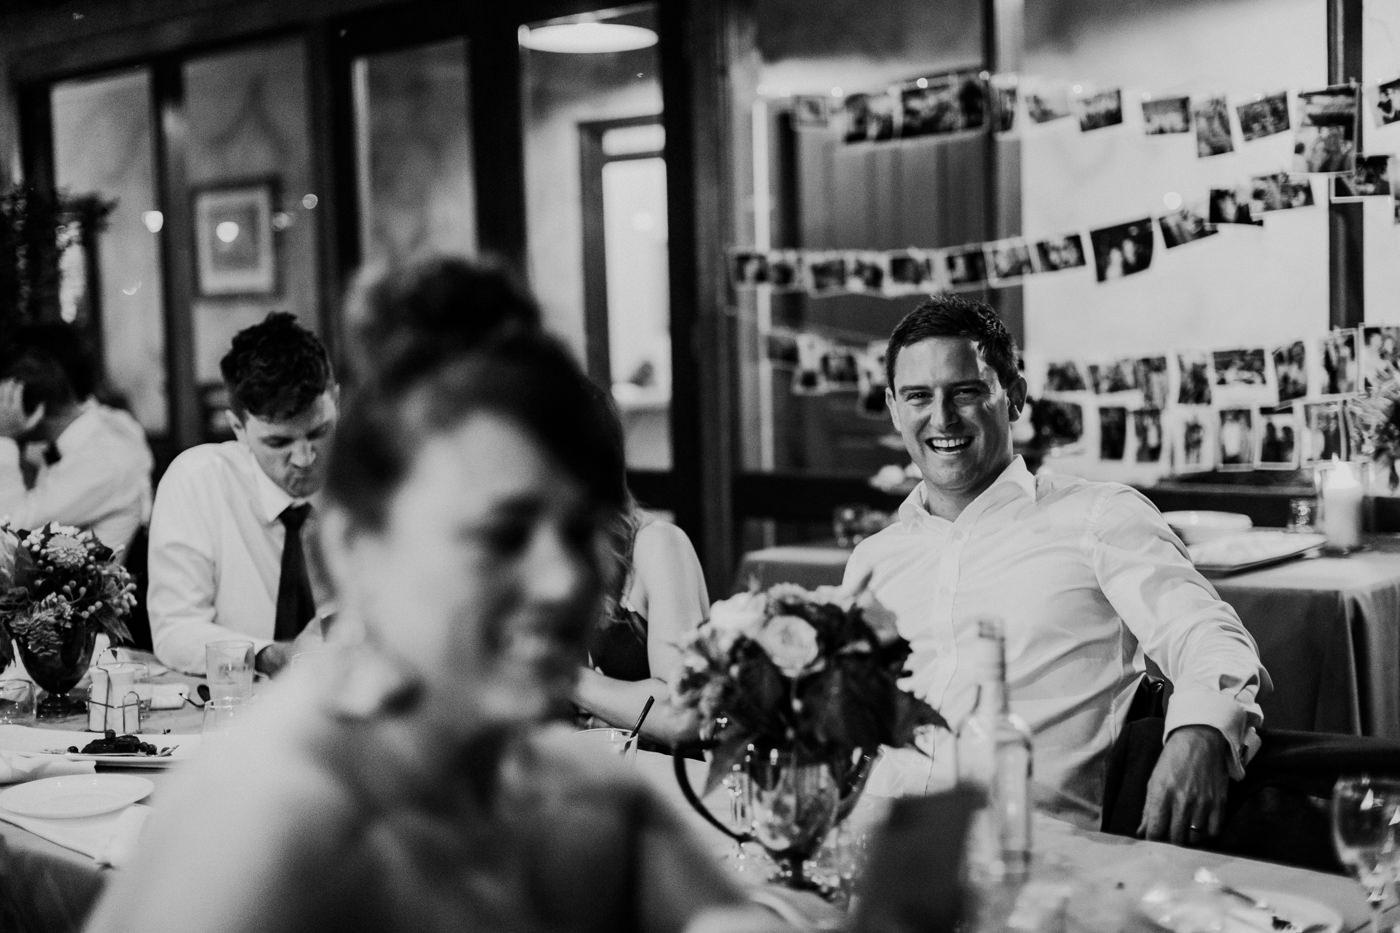 Anthony & Eliet - Wagga Wagga Wedding - Country NSW - Samantha Heather Photography-193.jpg